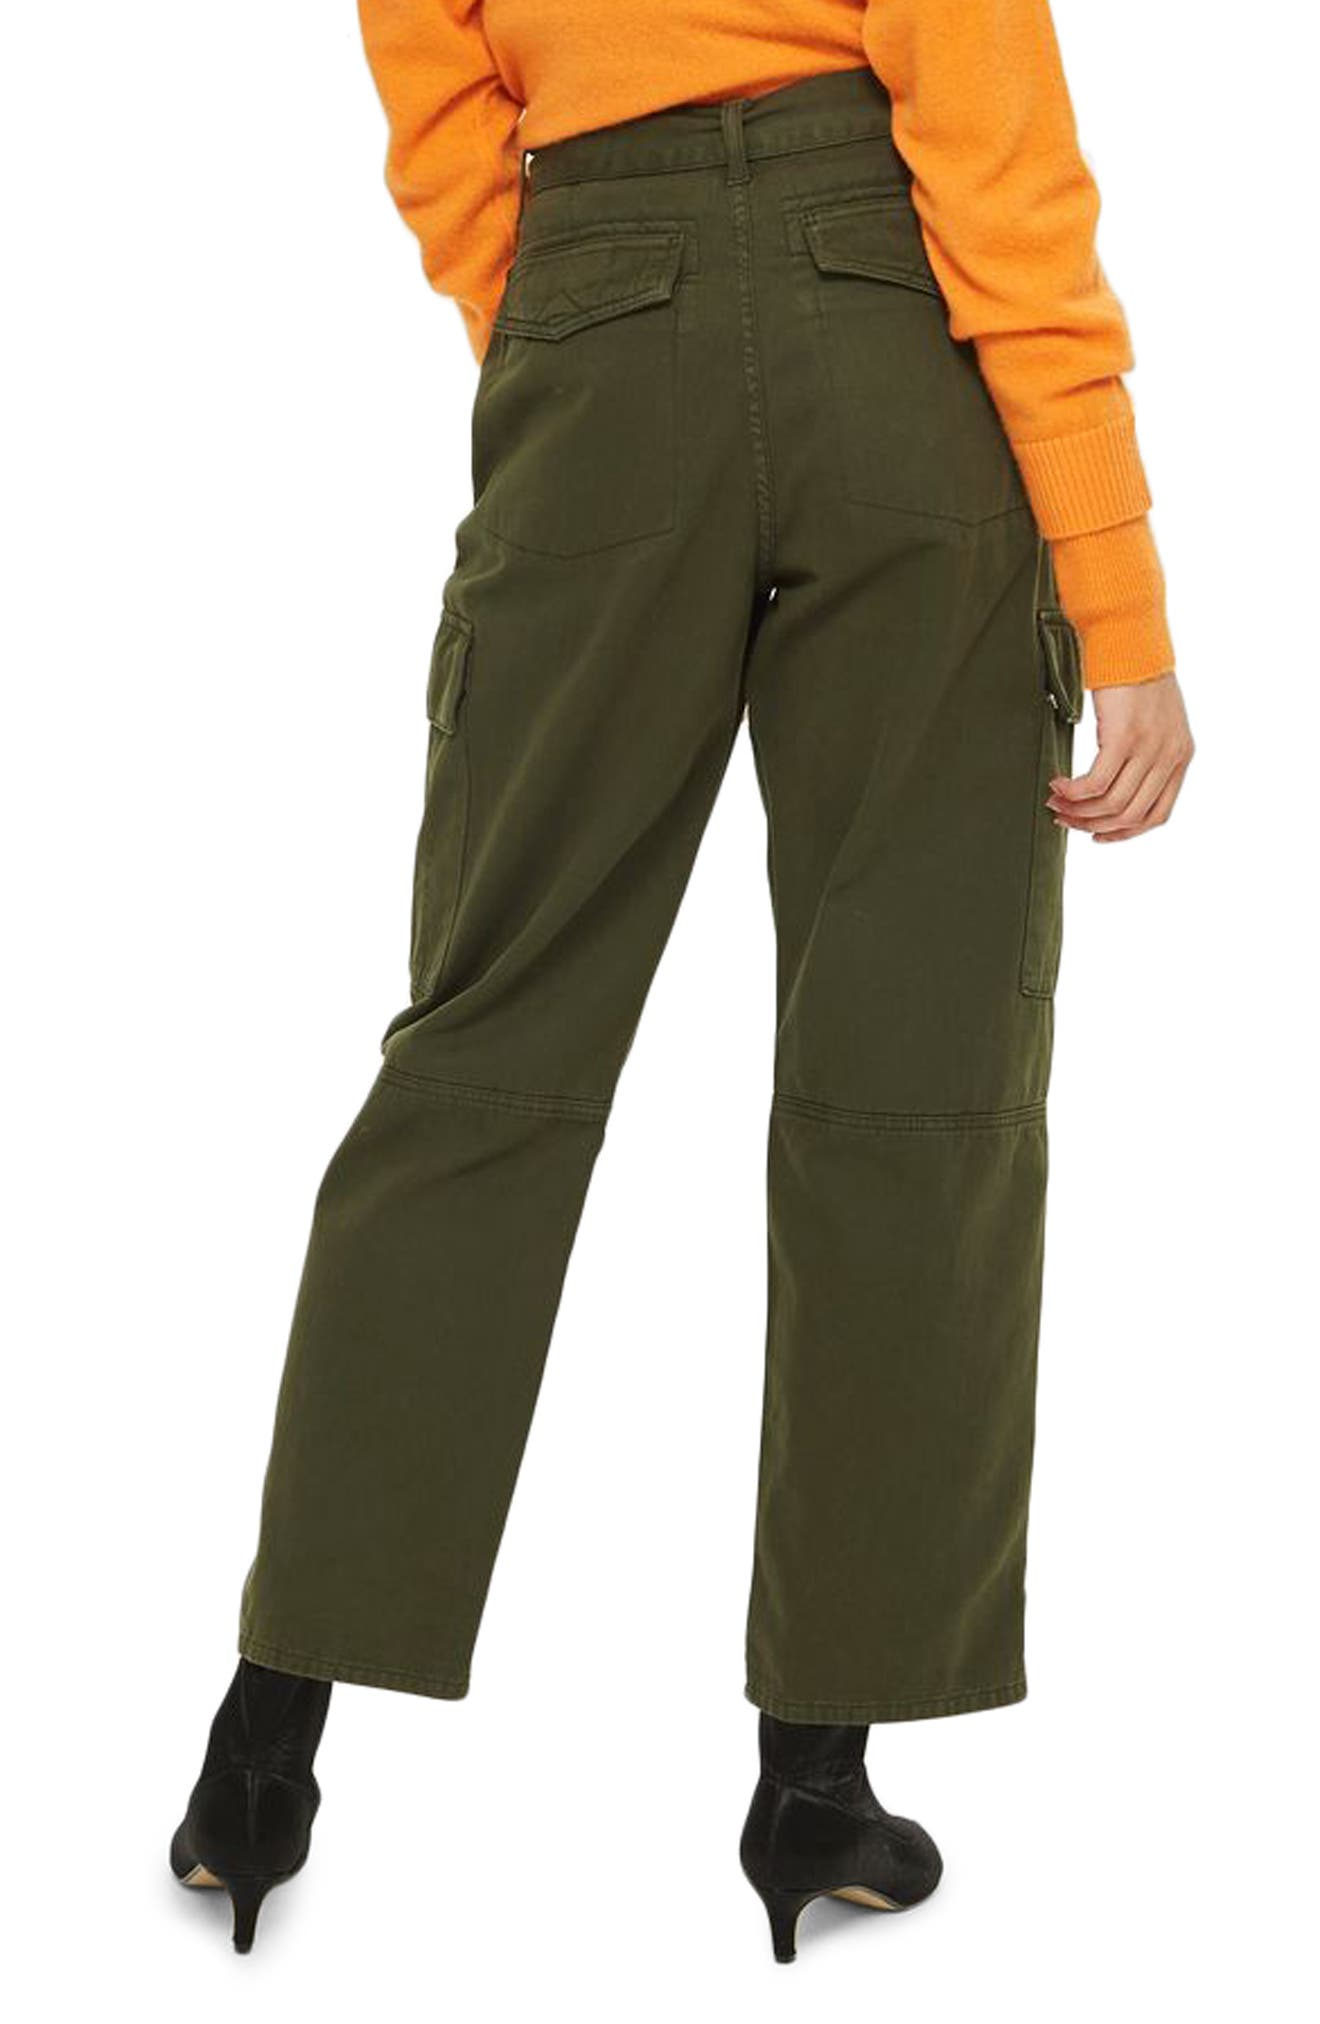 Combat Pocket Utility Trousers,                             Alternate thumbnail 2, color,                             310